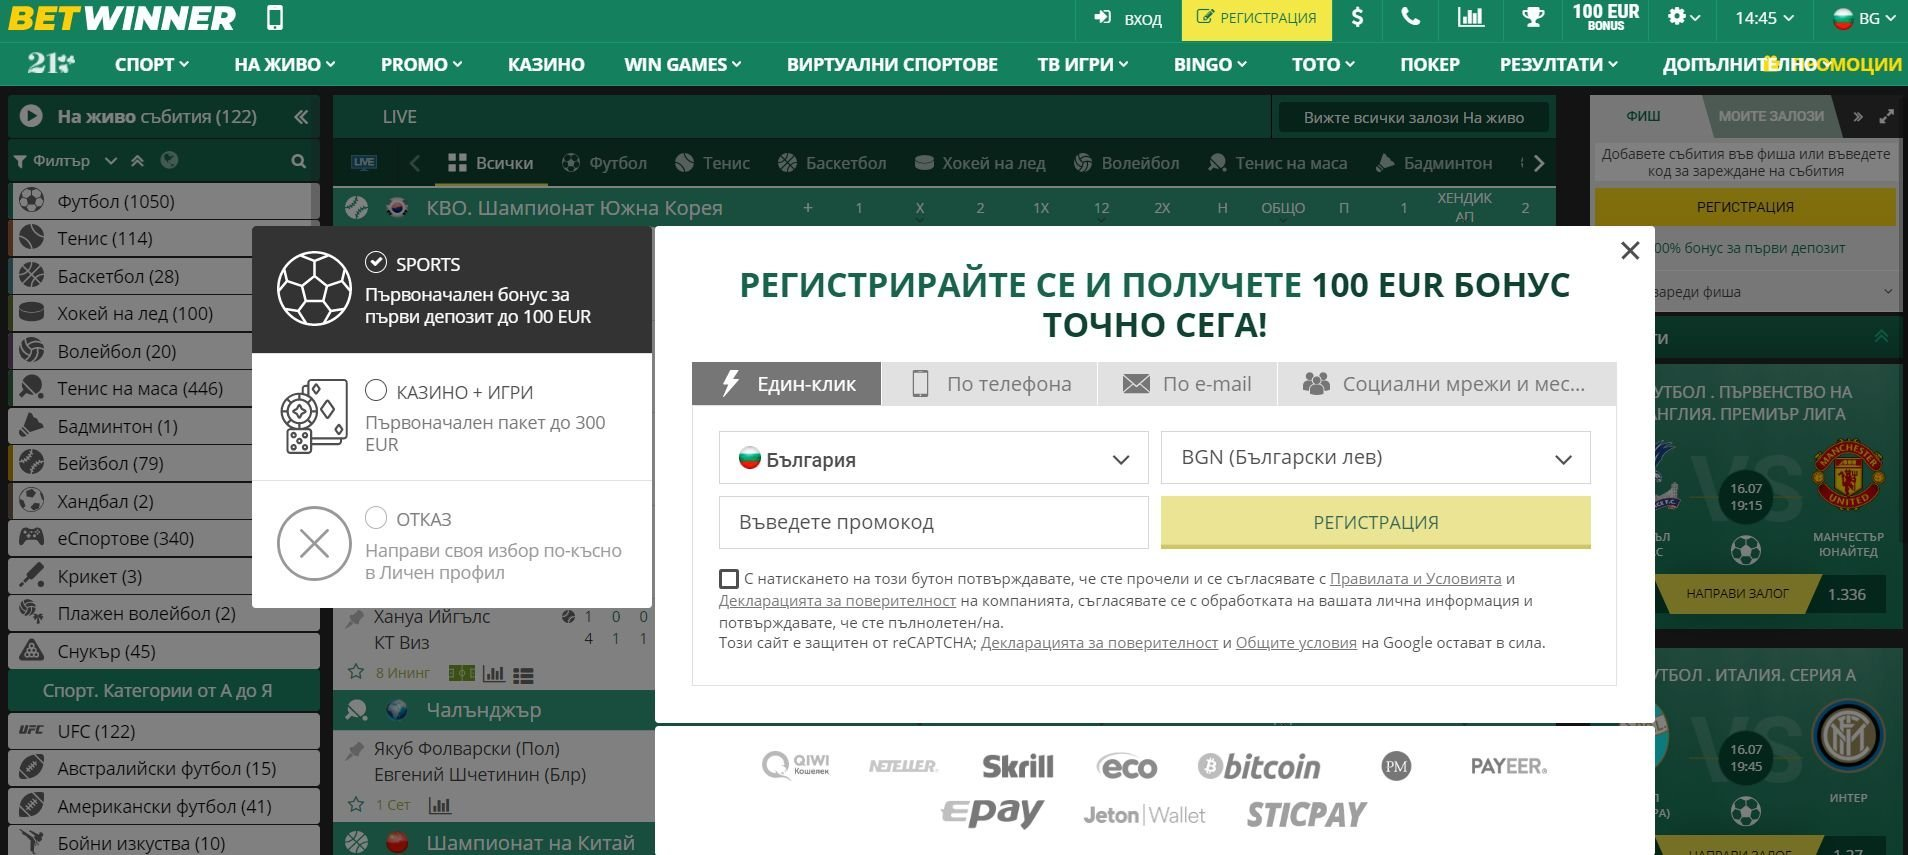 betwinner Казино регистрация